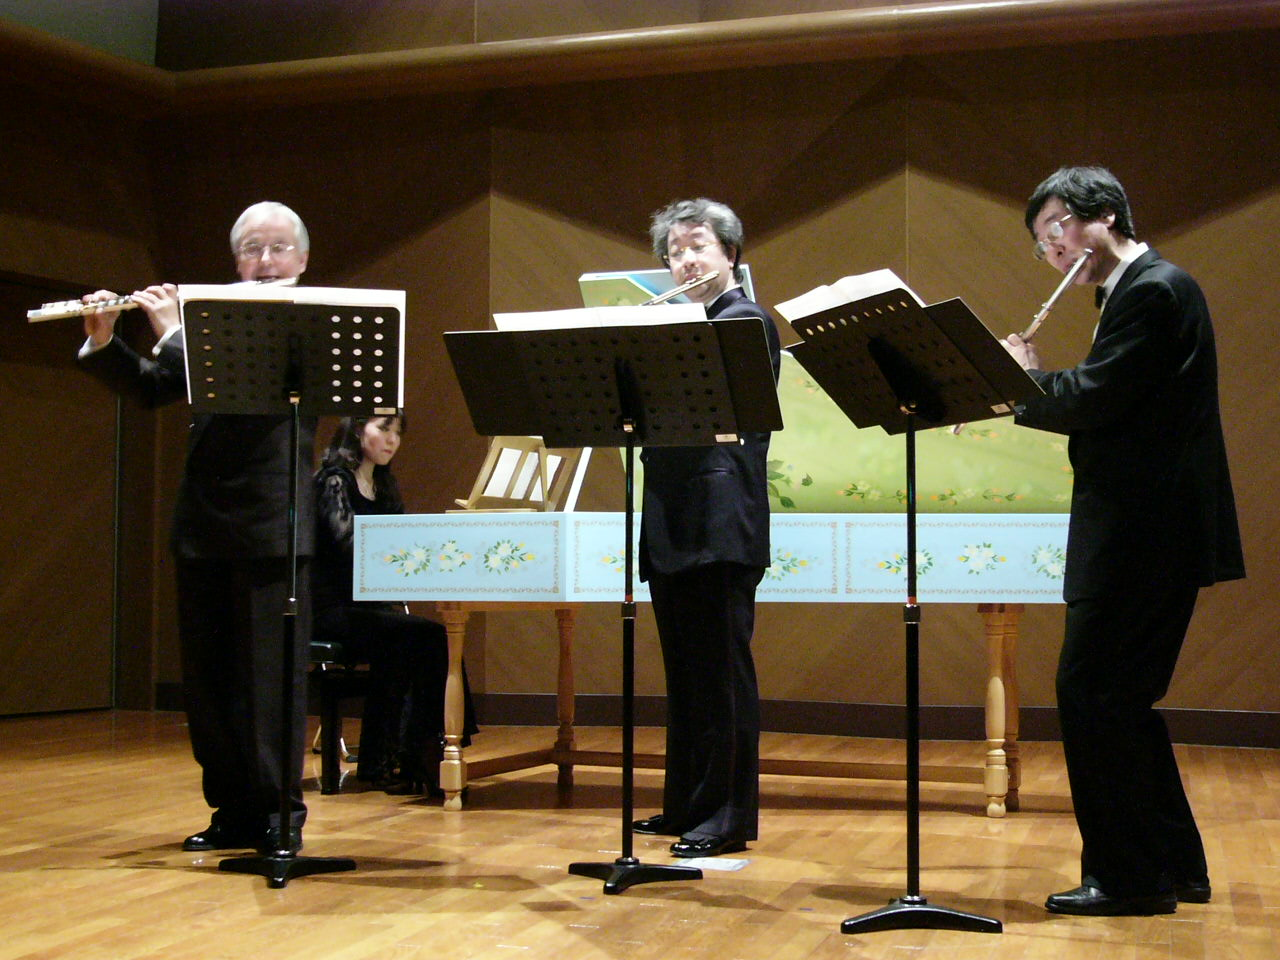 Muramatsu Recital Hall Osaka, 3. März 2004:  Johann Sebastian Bach, Triosonate D-Dur mit Gunther Pohl (Flöte, links) und Kyohei Yamamoto (Flöte, rechts)